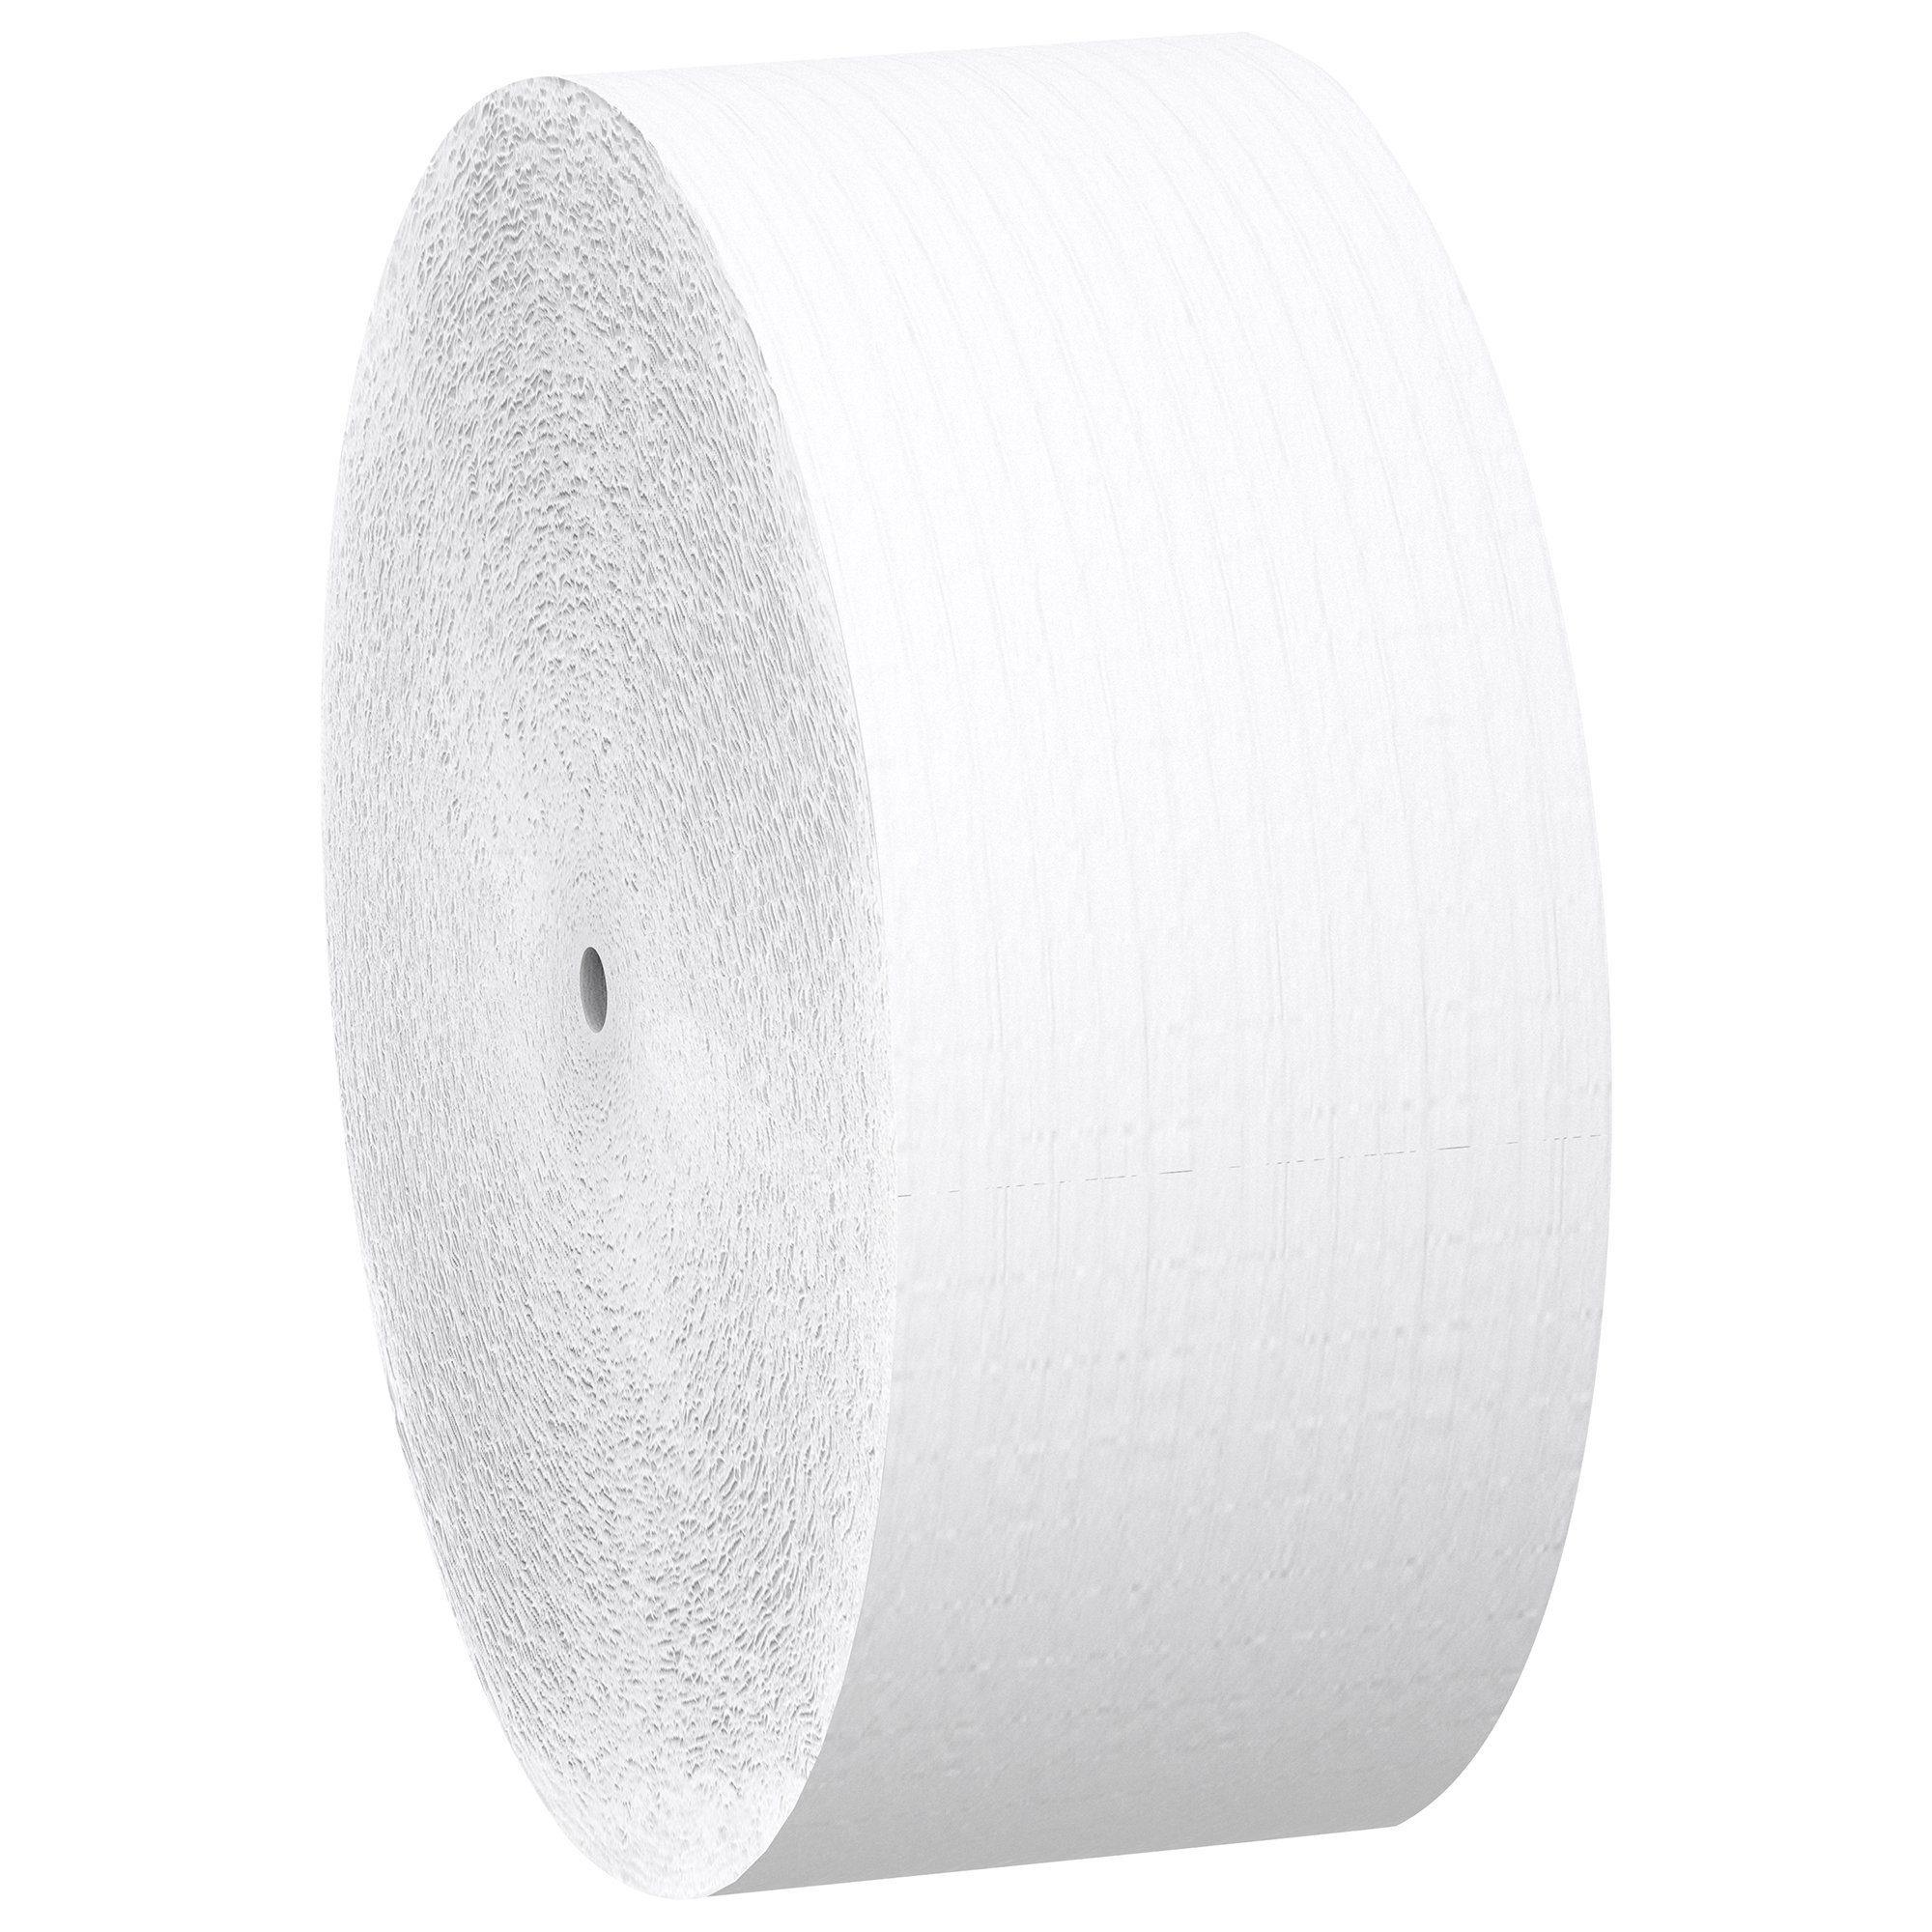 Scott Essential Jumbo Roll JR. Coreless Toilet Paper (07005), 2-PLY, White, 12 Rolls / Case, 2,300' / Roll by Kimberly-Clark Professional